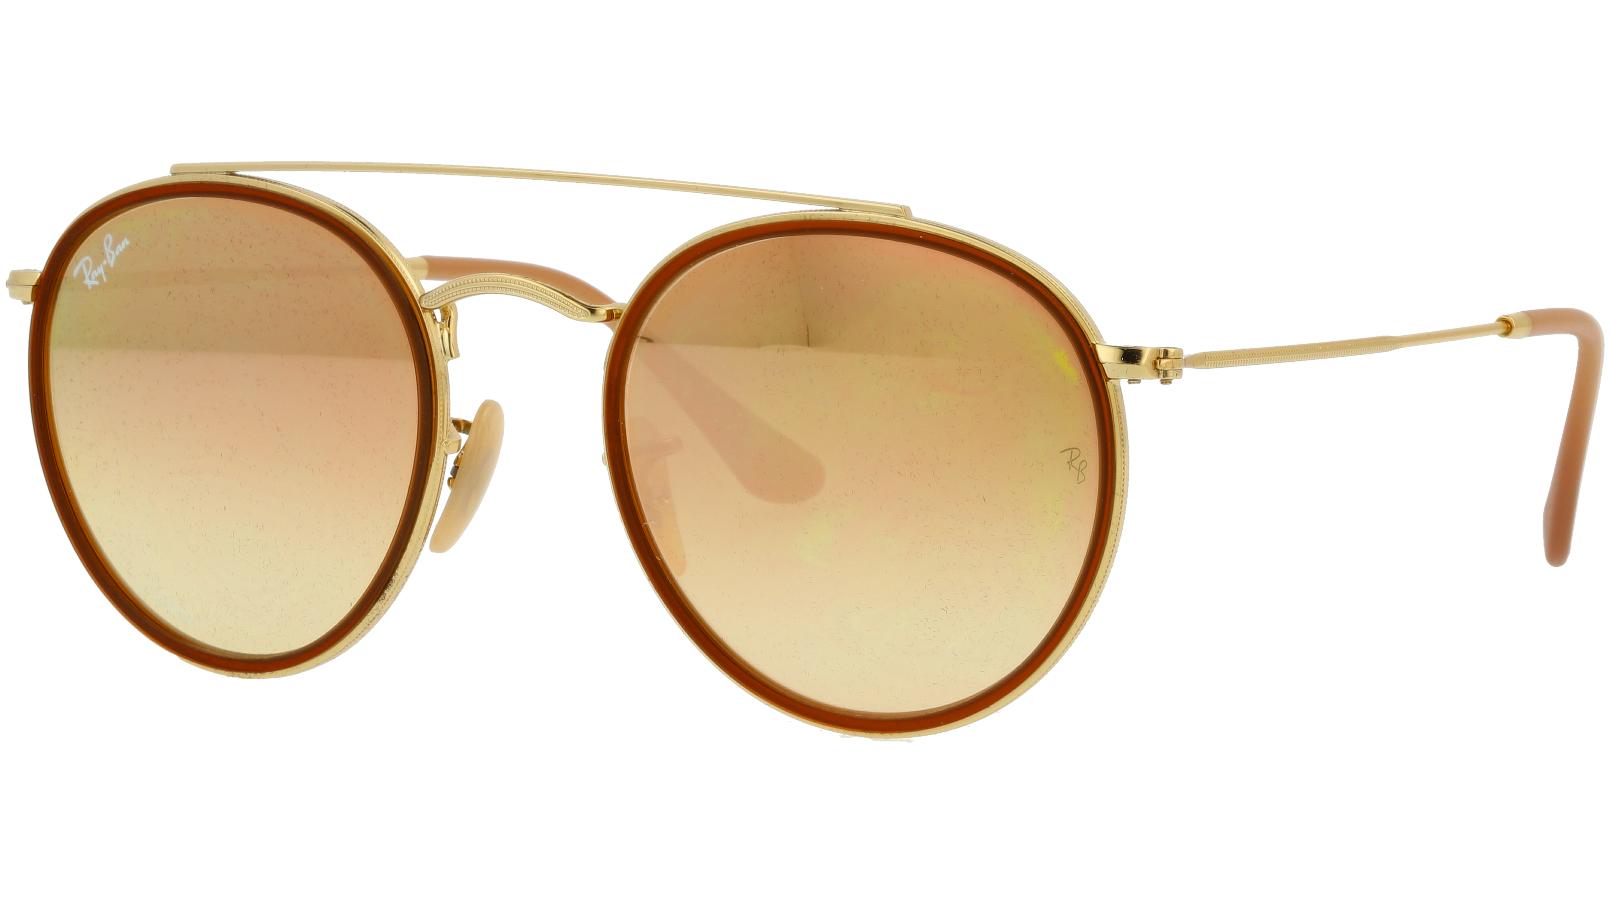 Ray-Ban RB3647N 001/7O Arista Round Sunglasses